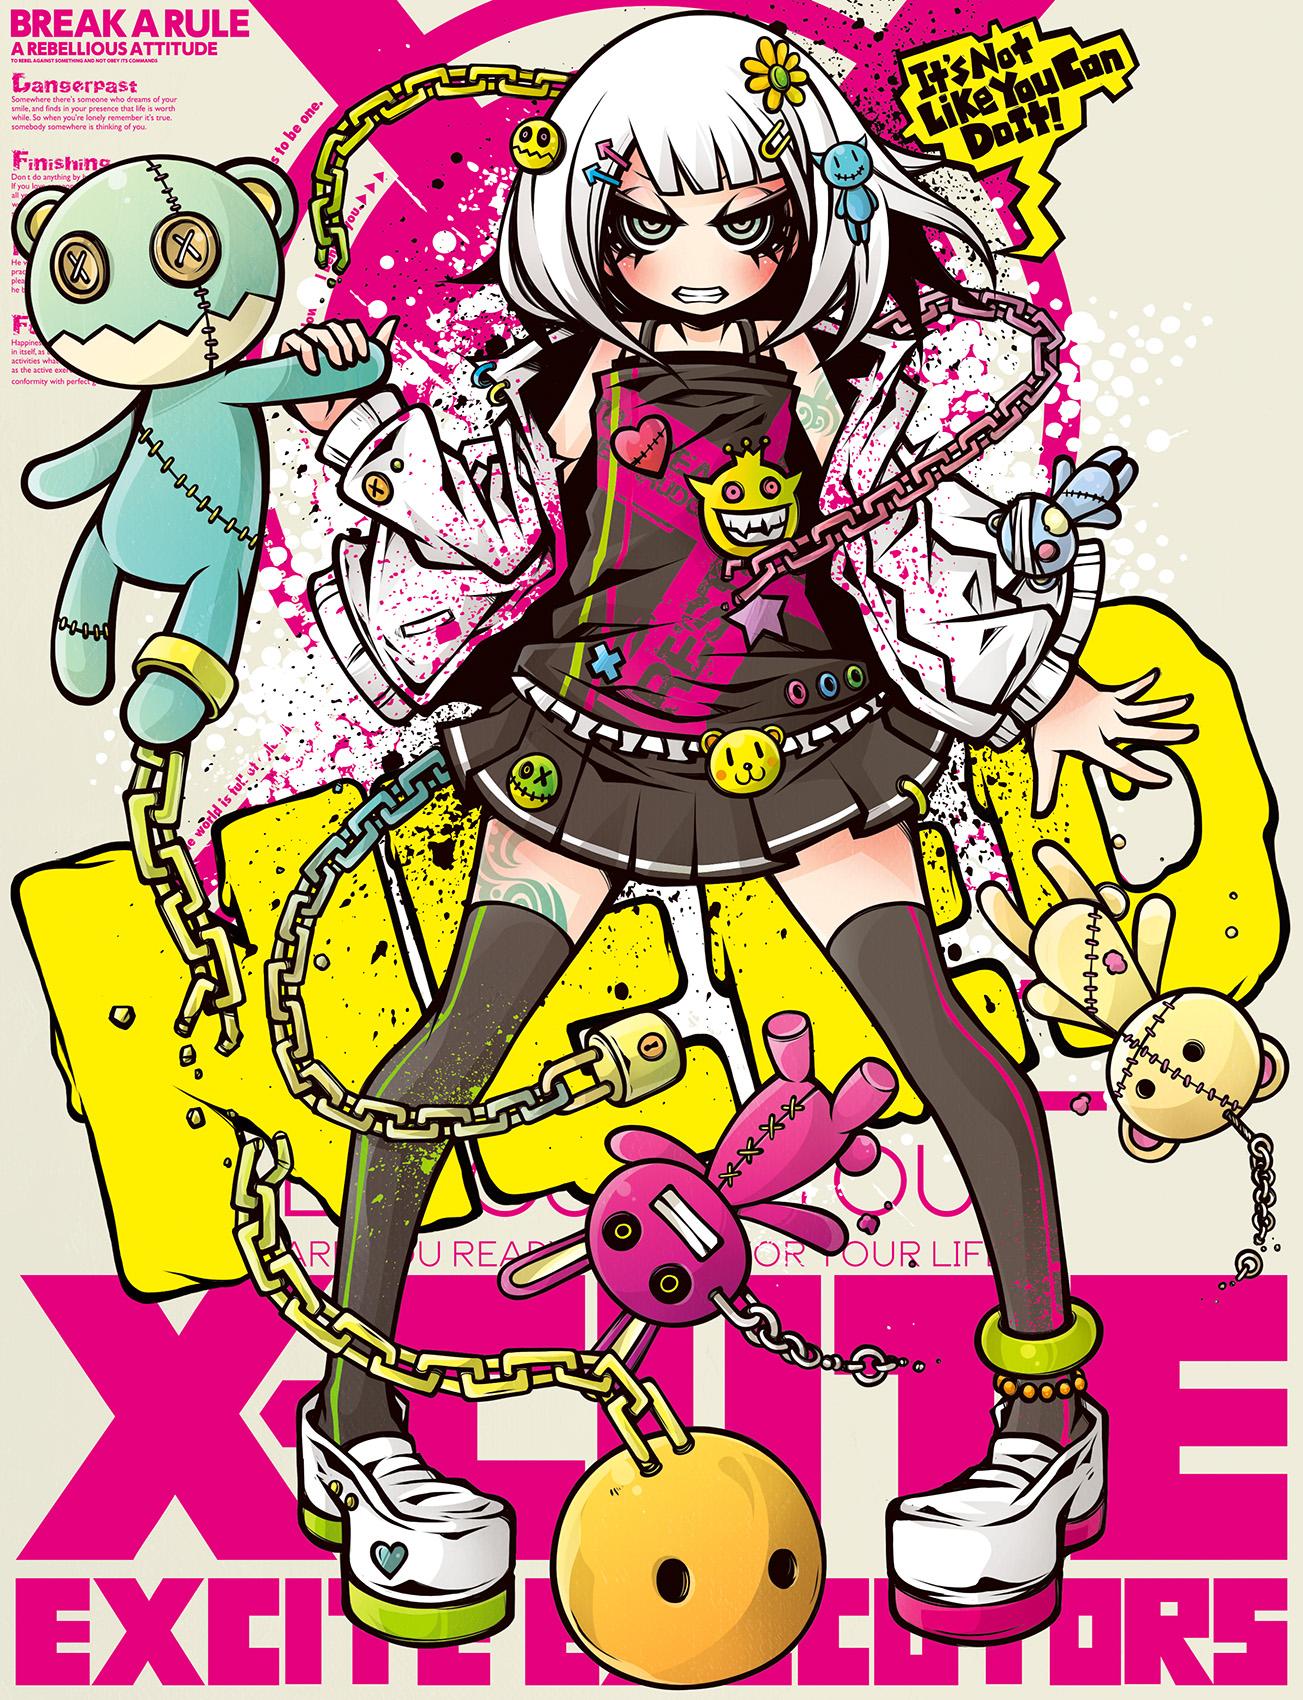 Unduh 300 Wallpaper Anime Original Hd HD Gratis